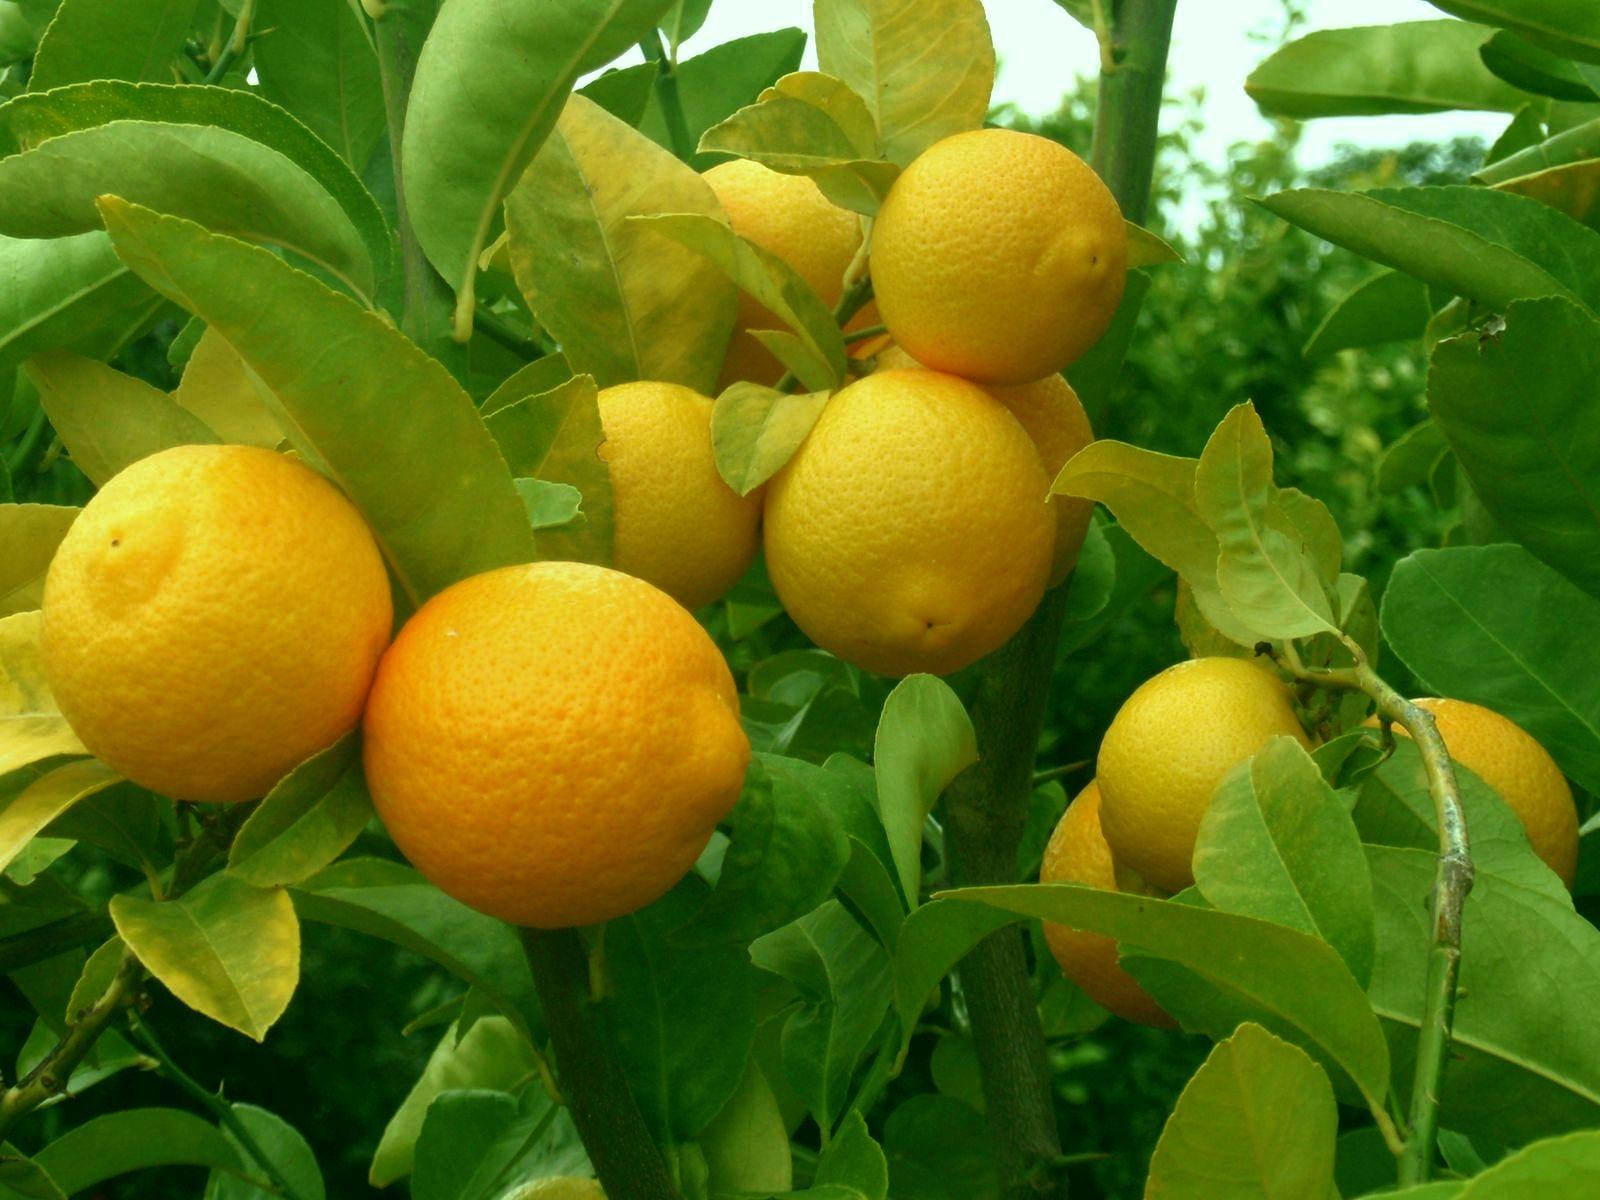 волкамер лимон волкамериана